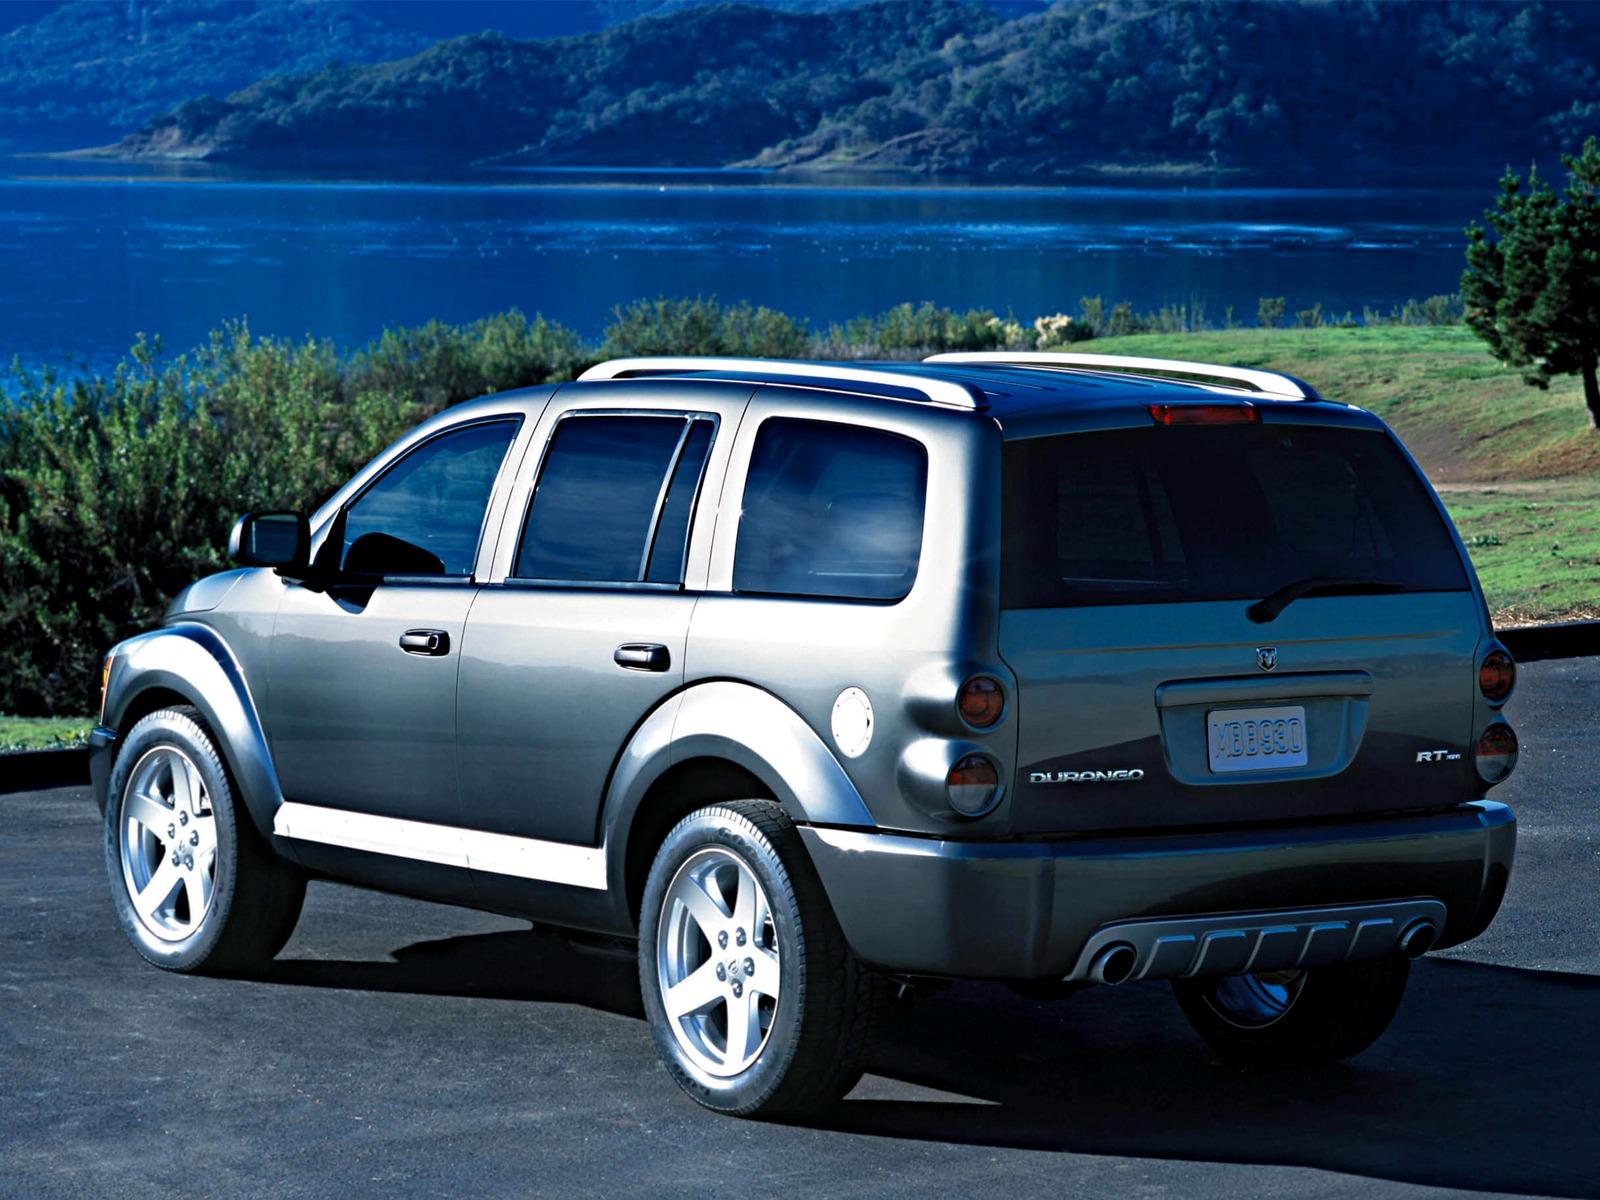 dodge durango hemi rt concept 2003 old concept cars. Black Bedroom Furniture Sets. Home Design Ideas